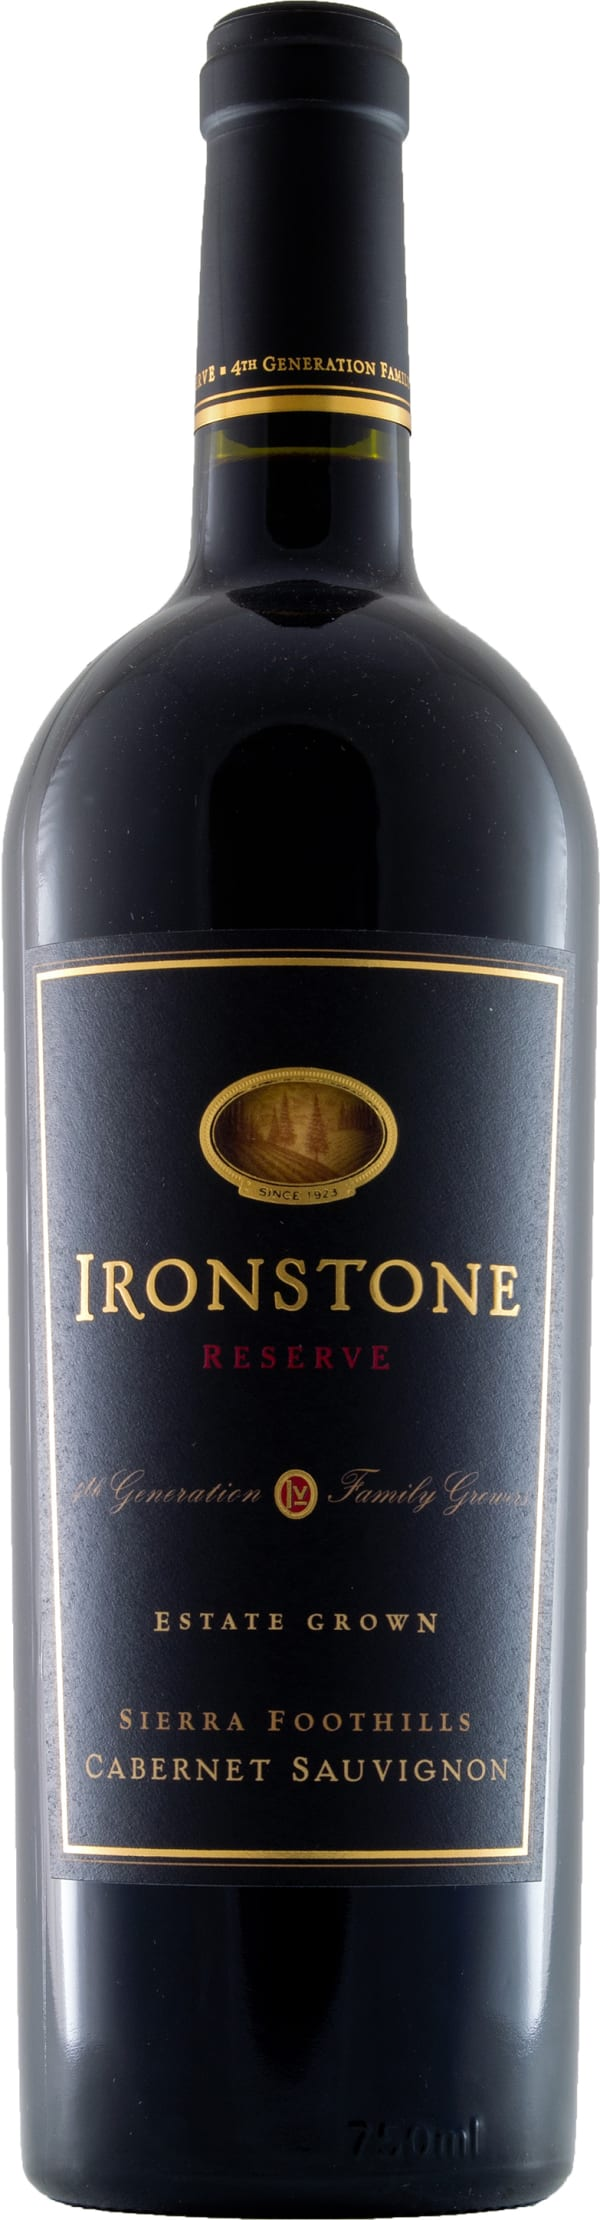 Ironstone Estate Grown Reserve Cabernet Sauvignon 2012